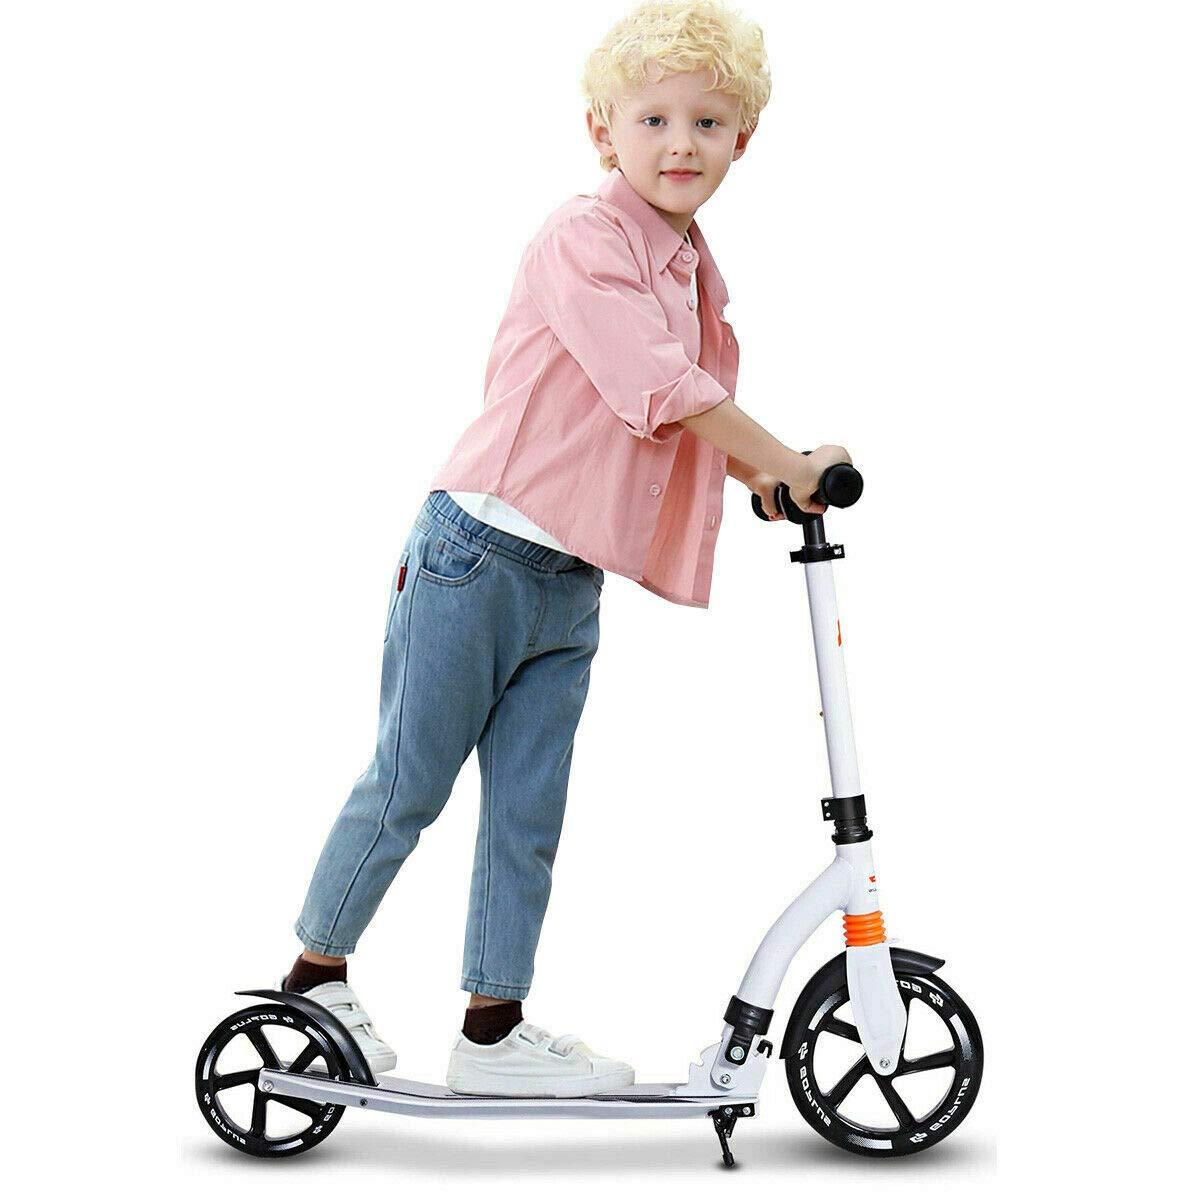 Foldable Aluminum Kids Kick Scooter Height Adjustable w Shoulder Strap Kickstand